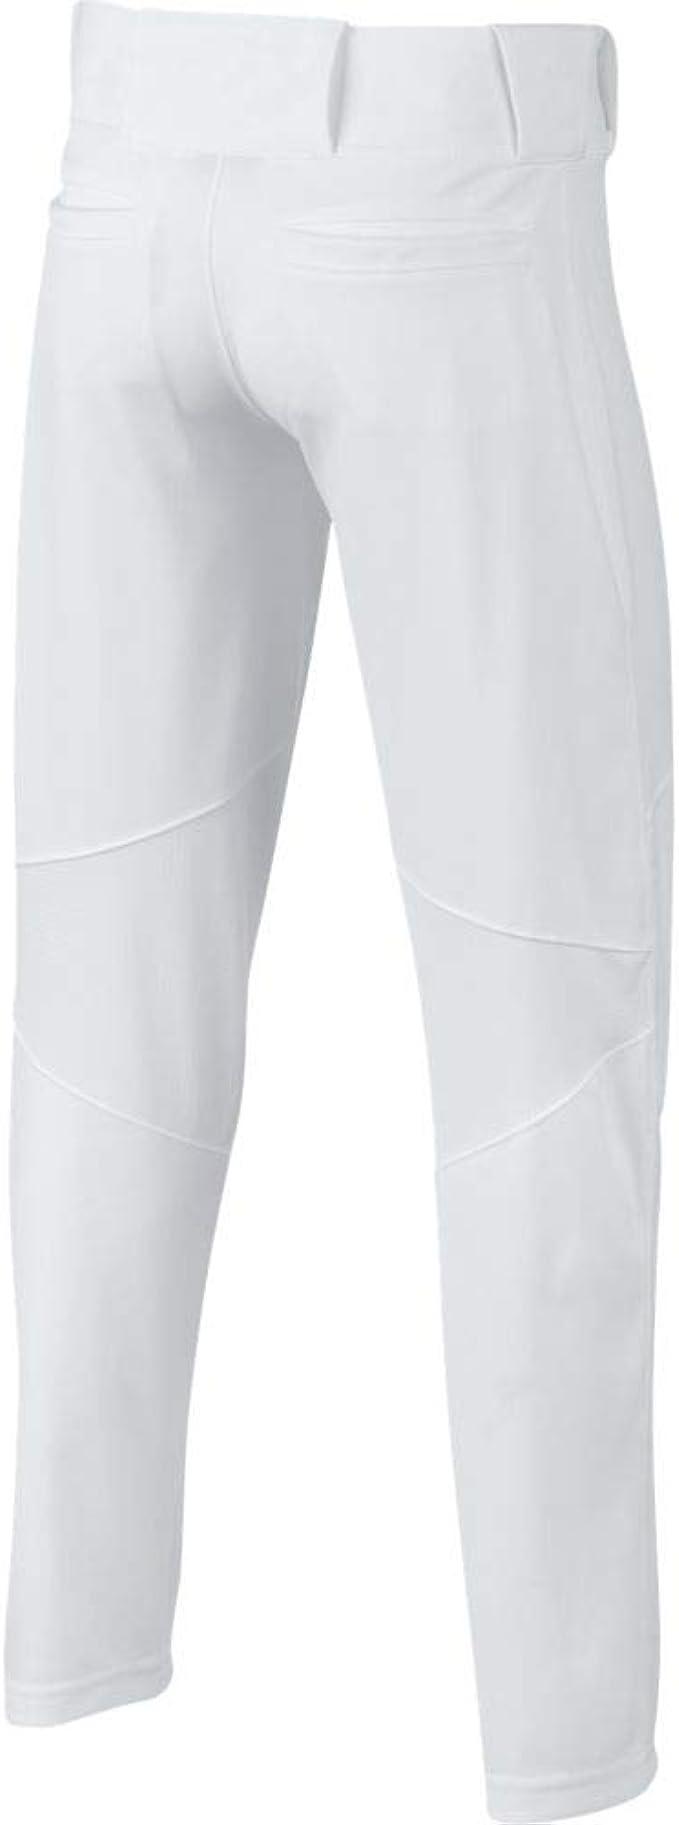 Amazon.com: Nike Pro Vapor - Pantalones de béisbol para niño ...